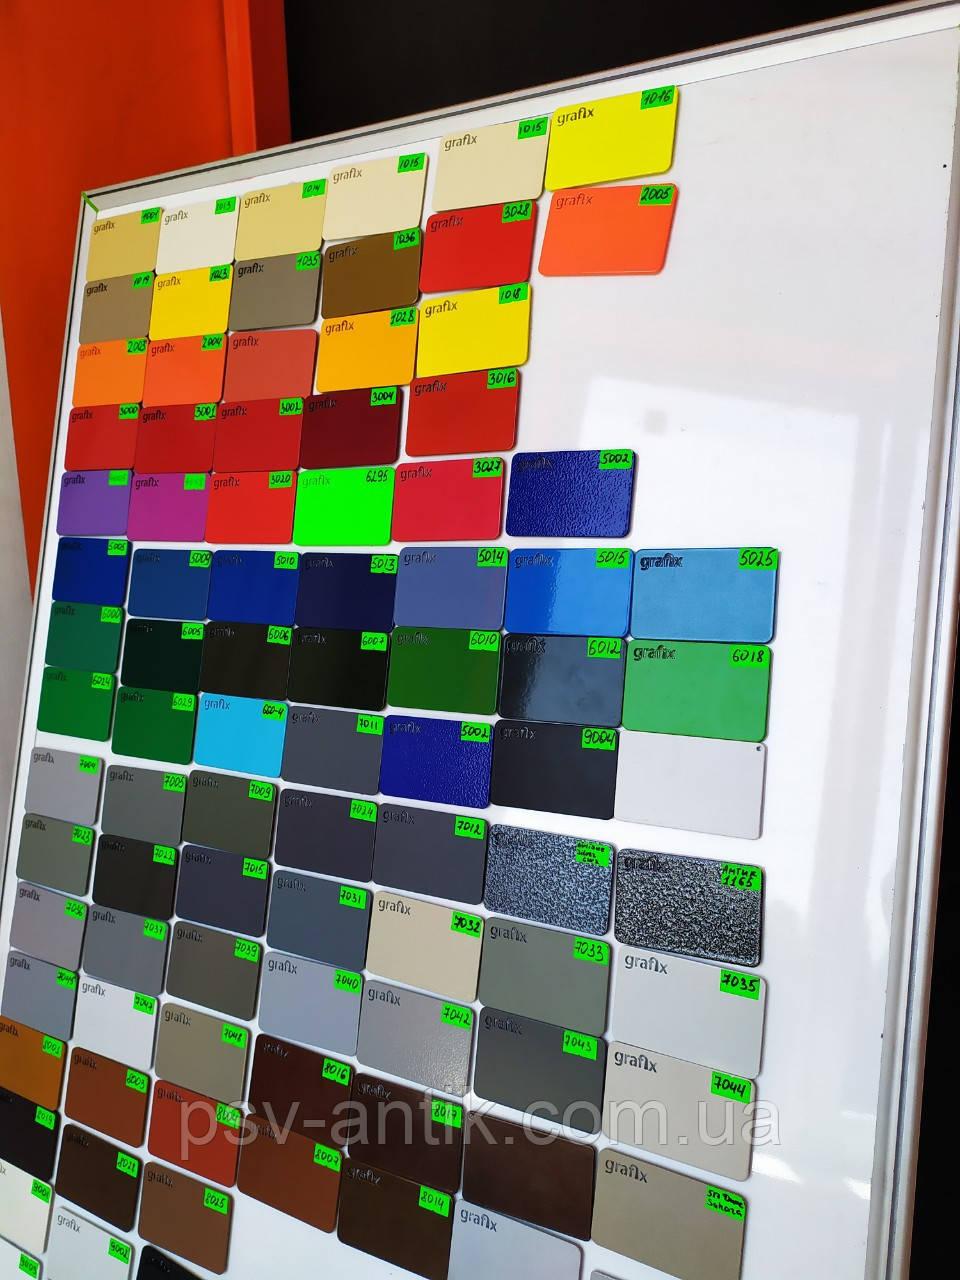 Порошковая краска глянцевая, полиэфирная, архитектурная, 5022